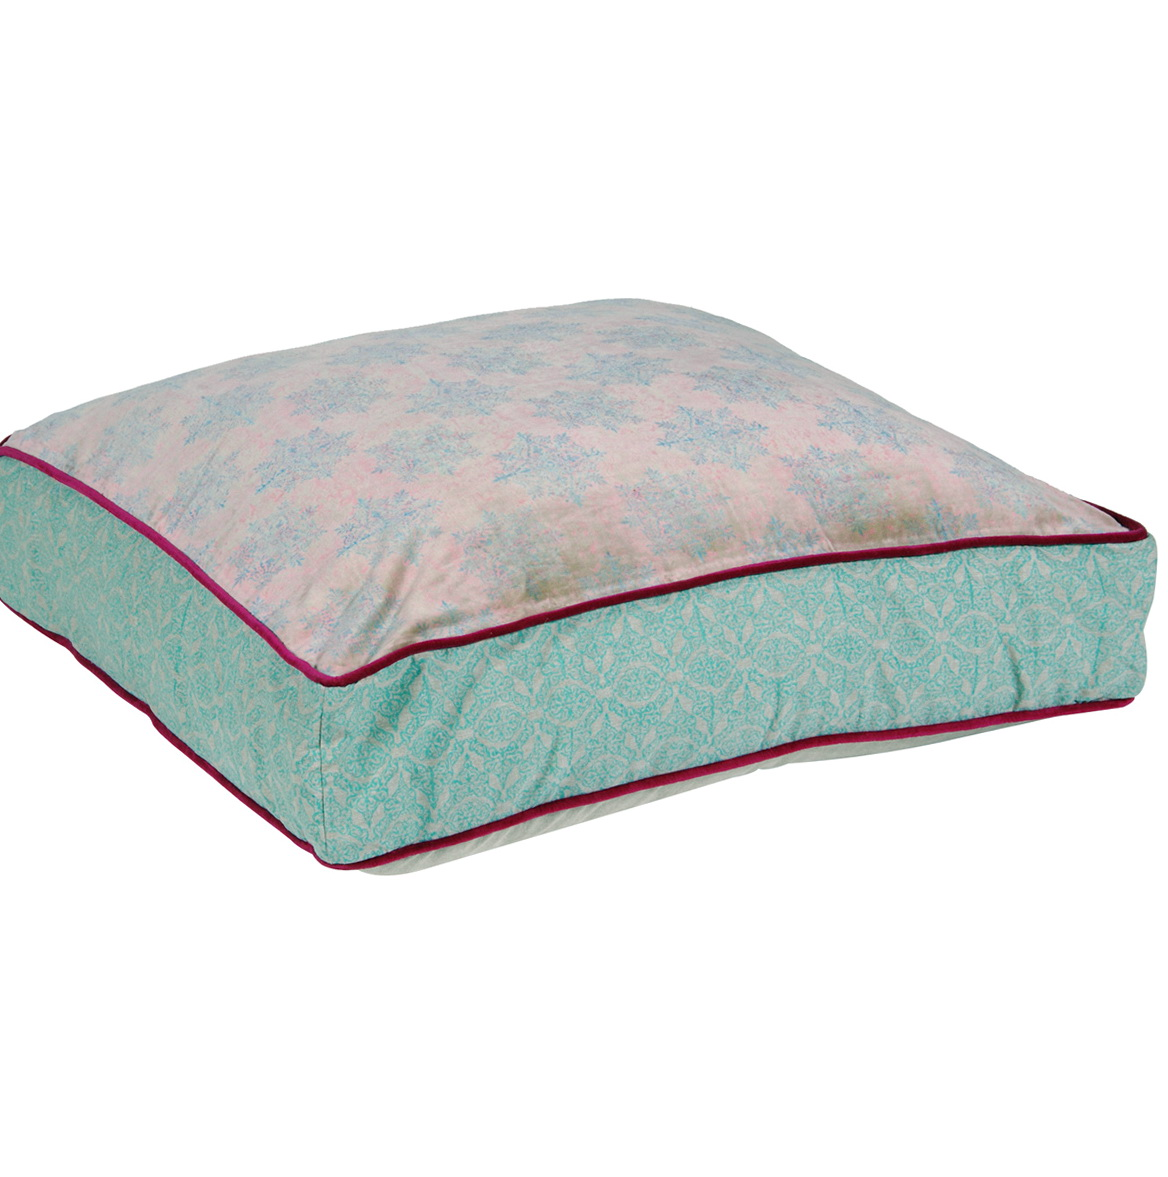 Large Floor Cushions Uk